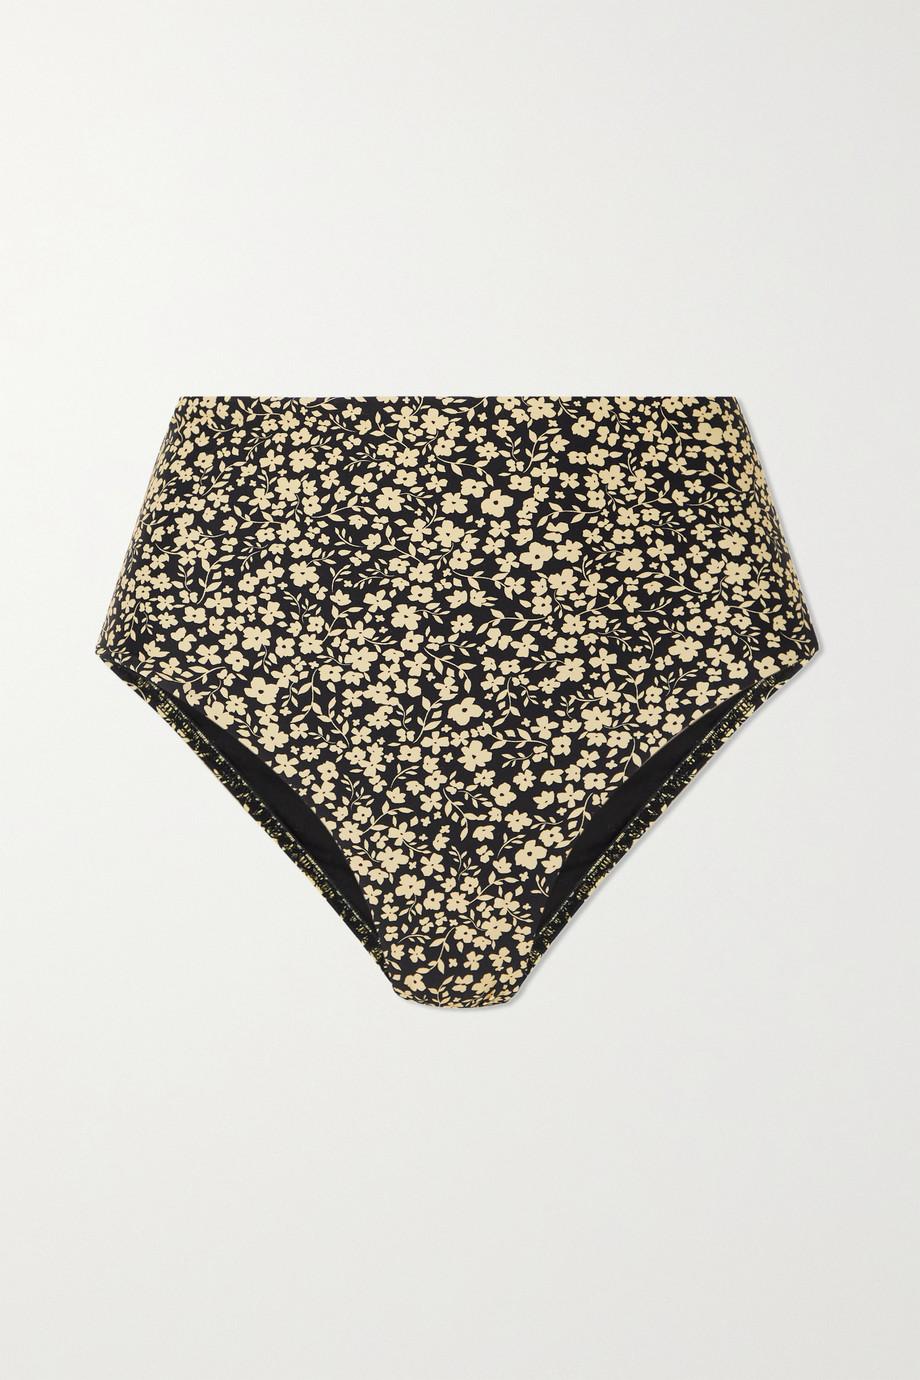 Matteau + NET SUSTAIN The High Waist floral-print stretch-ECONYL bikini briefs